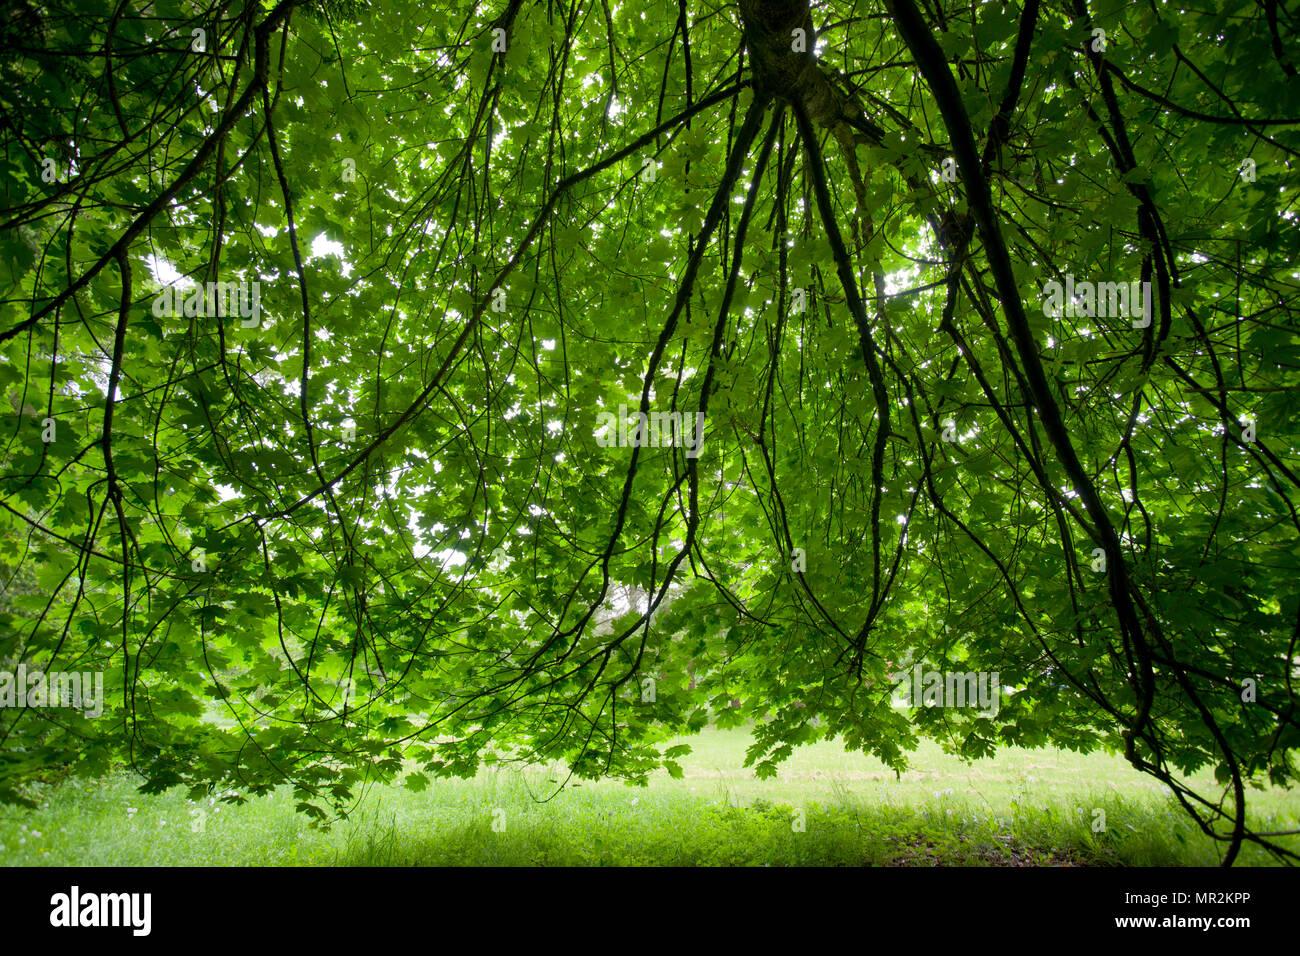 Acer Macrophyllum Bigleaf Maple Stock Photo 186300206 Alamy